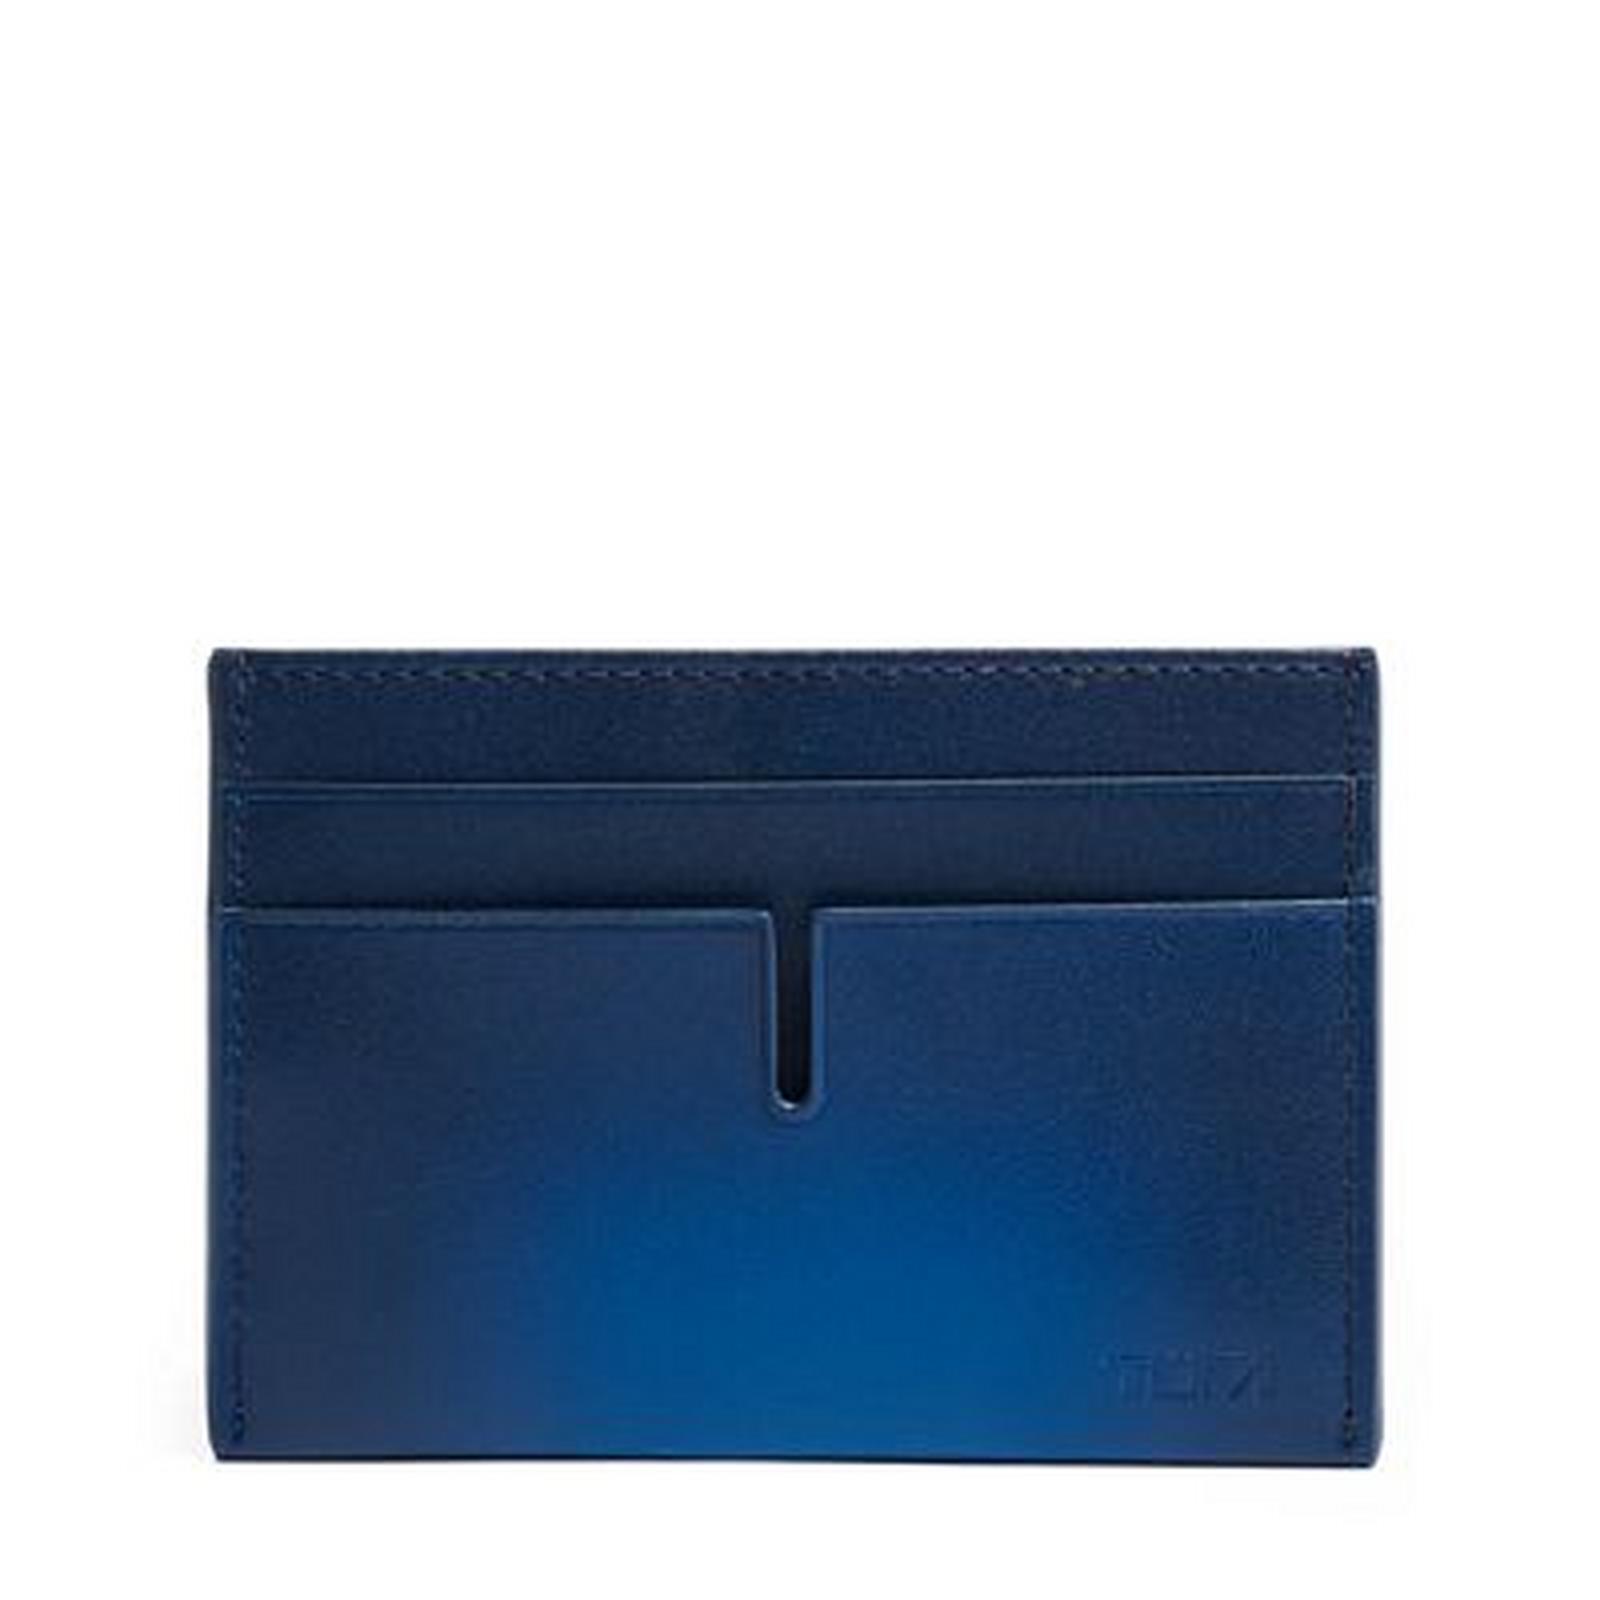 TUMI ID Lock? Money Clip Card Case